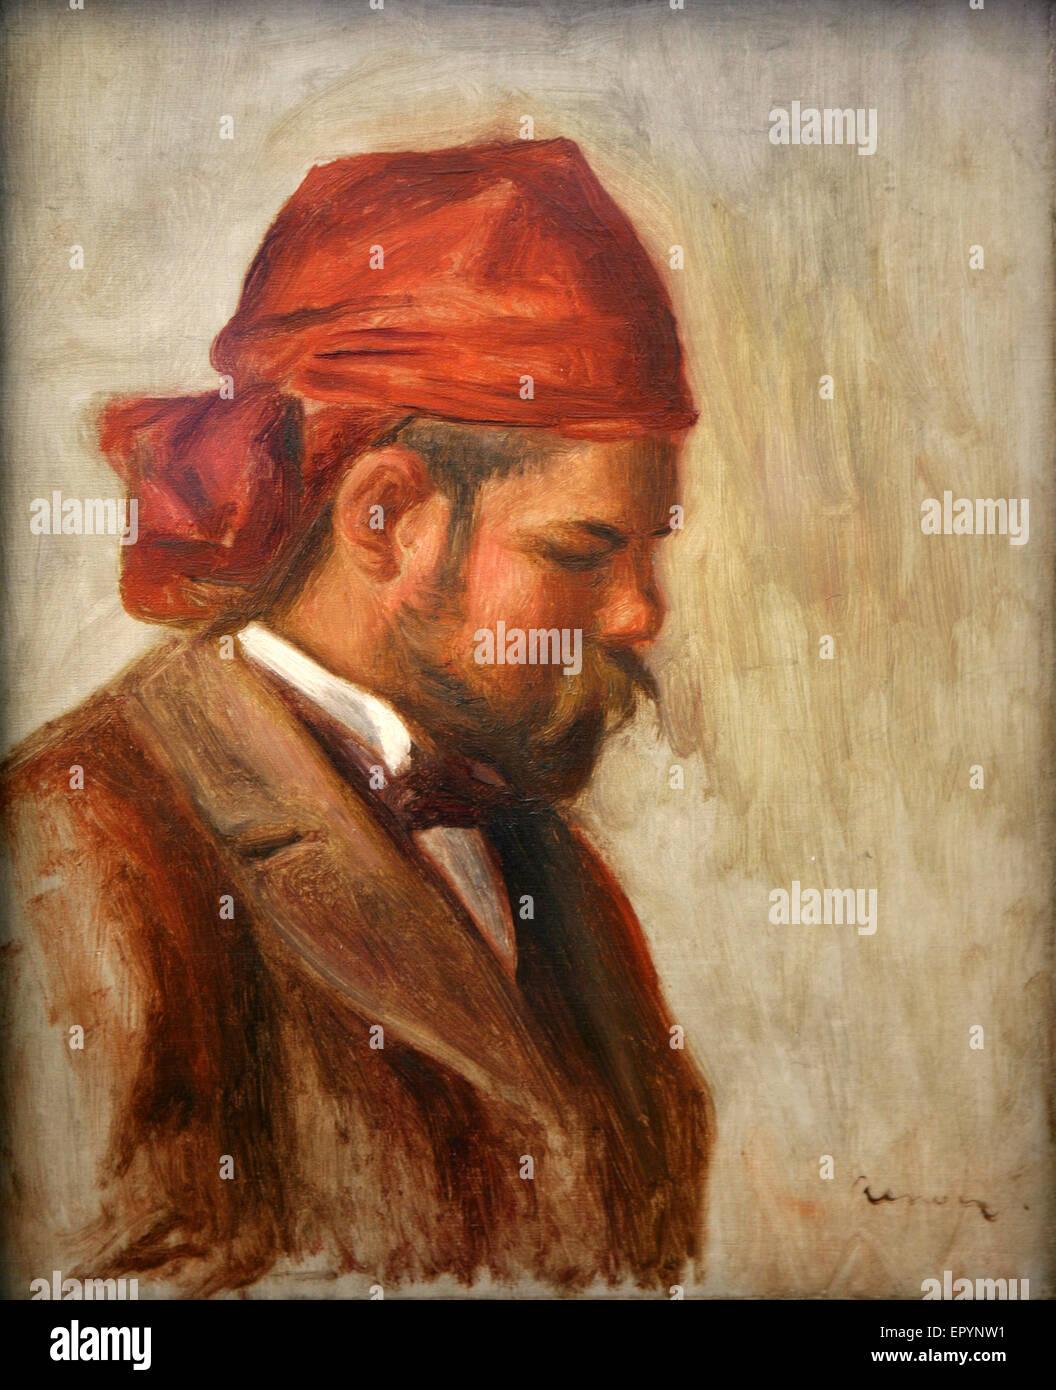 Pierre-Auguste Renoir  - 1899 - Ambroise Vollard au foulard rouge - Stock Image